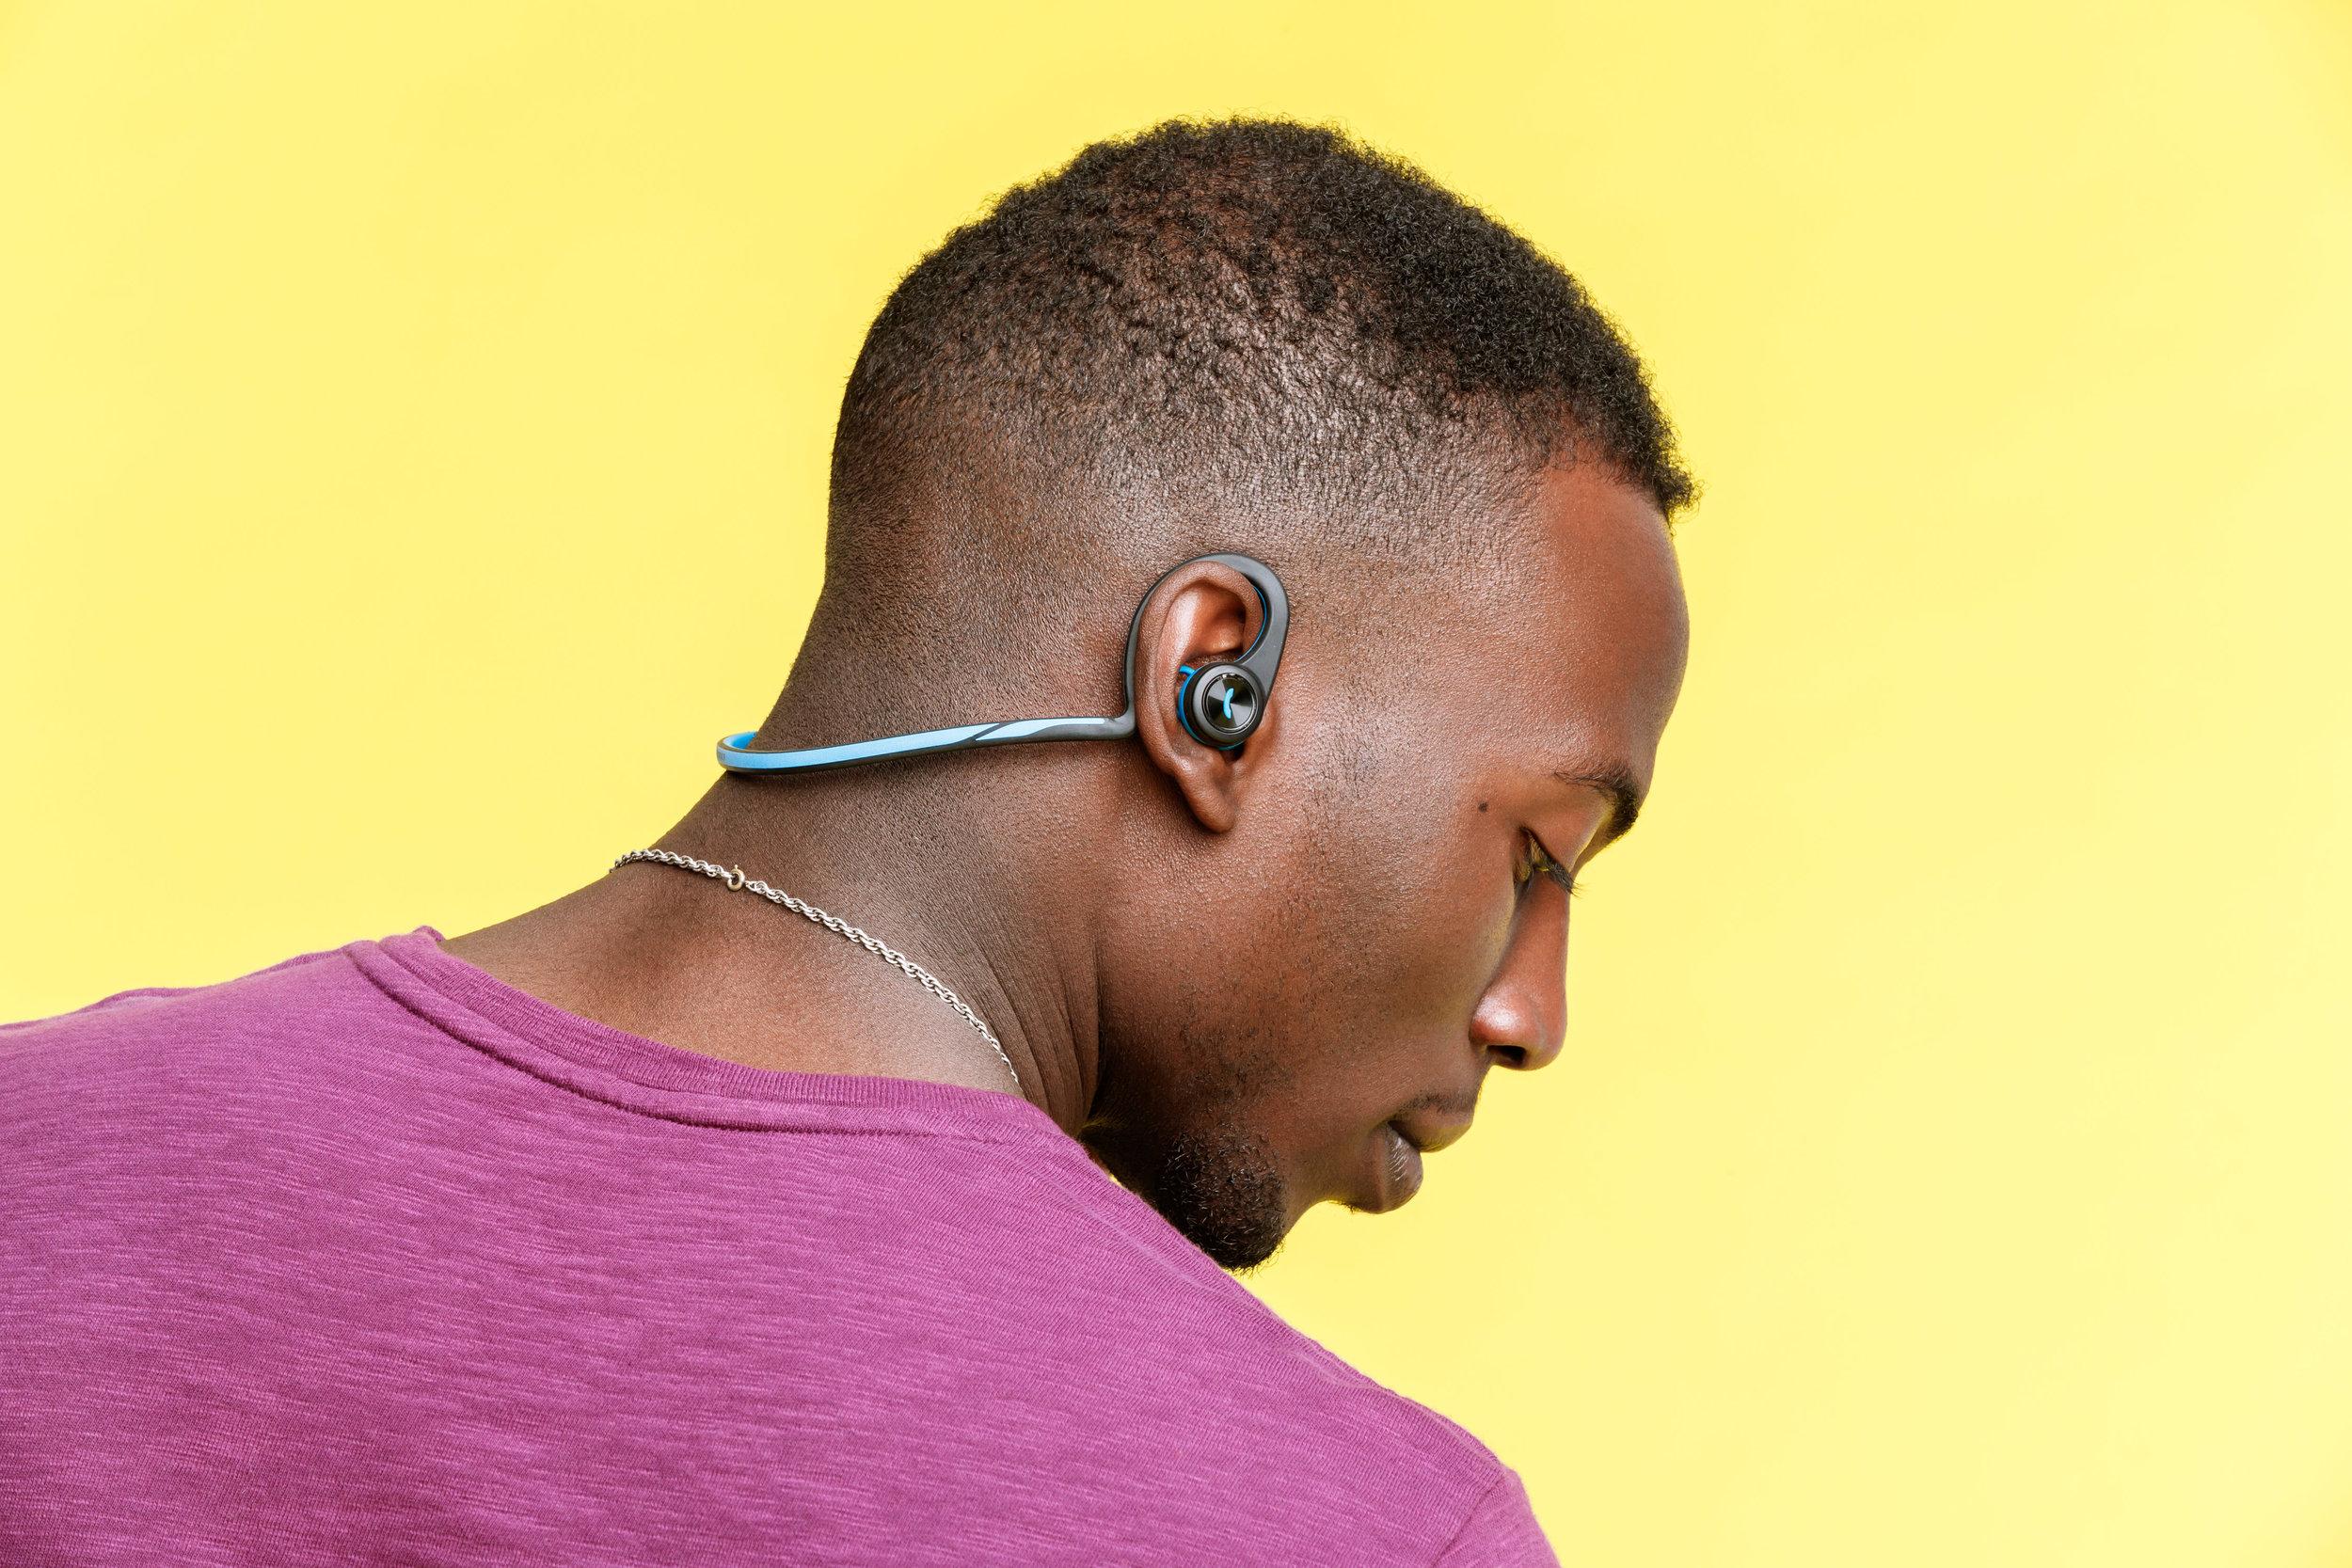 092916_MO_Ebay_Headphones_Plantronics_0057-V02.jpg